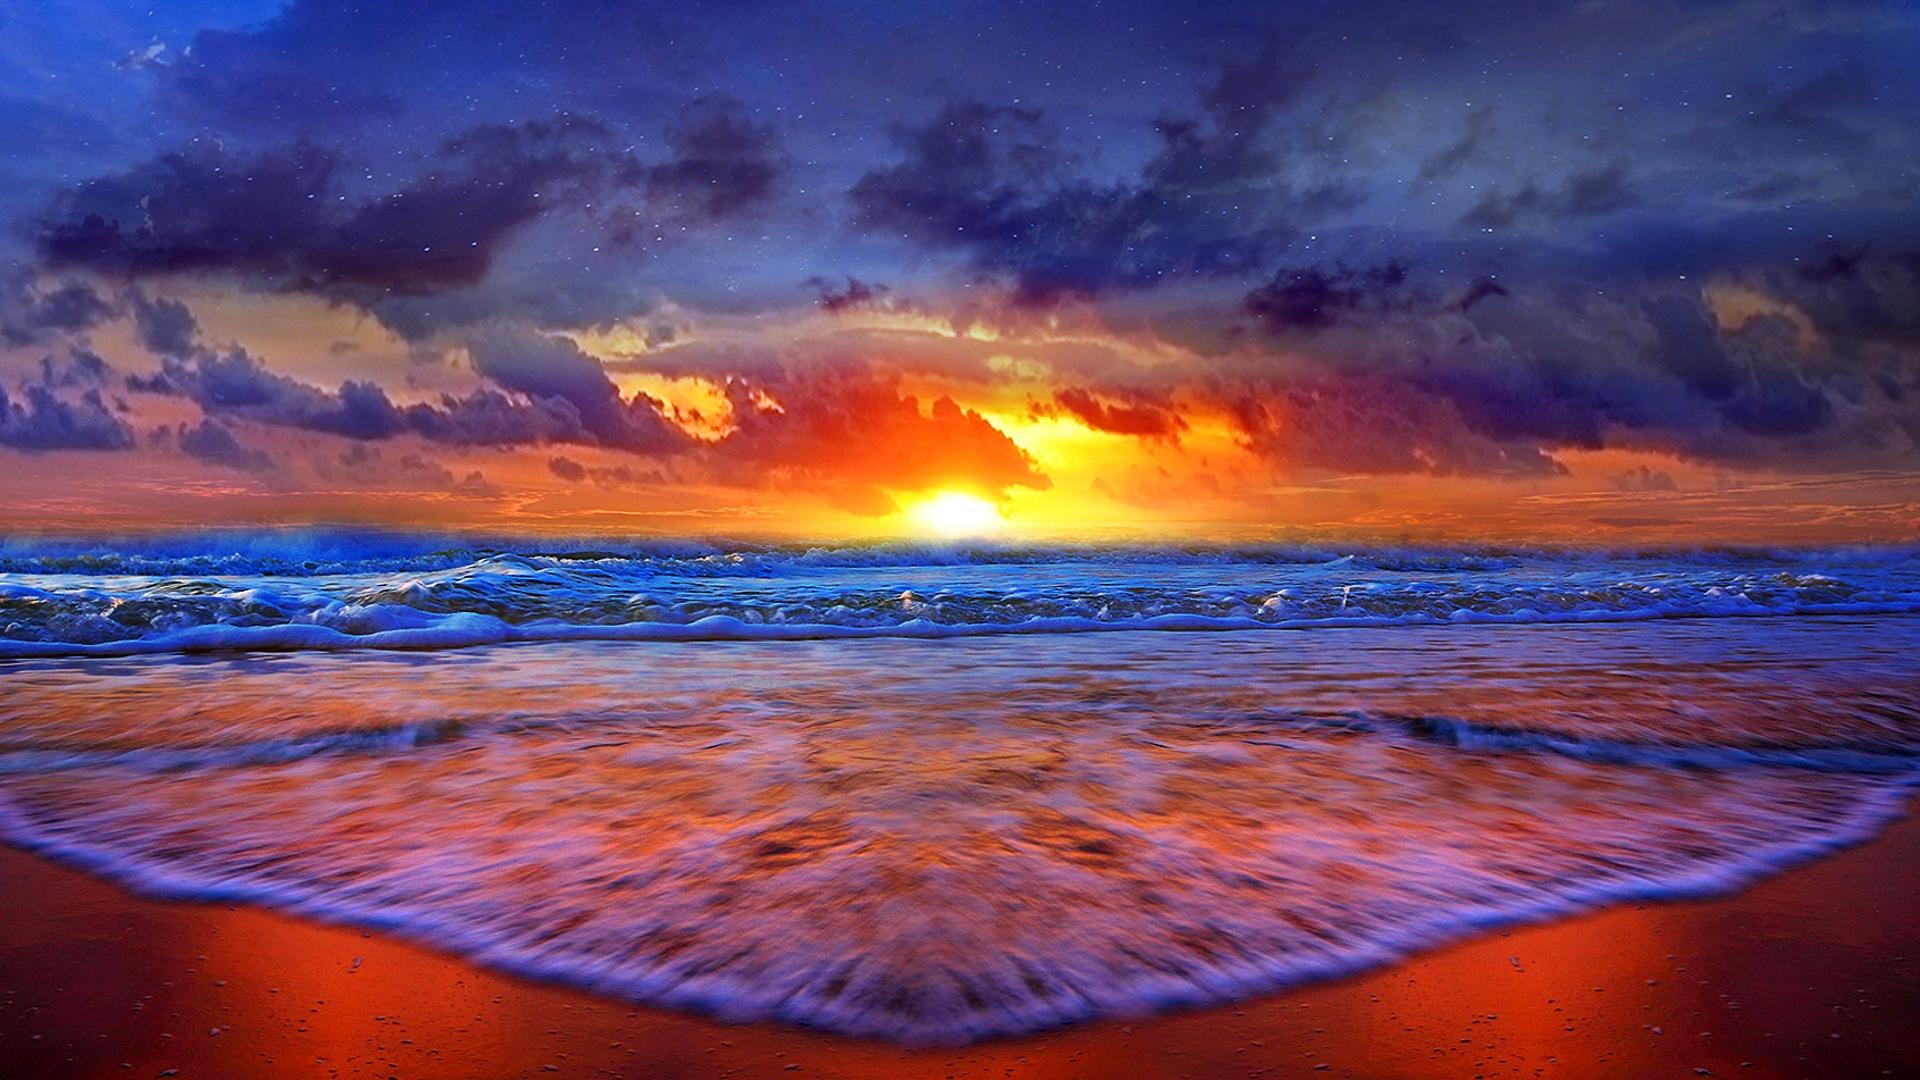 The Sunset HD Desktop Background 1920x1080